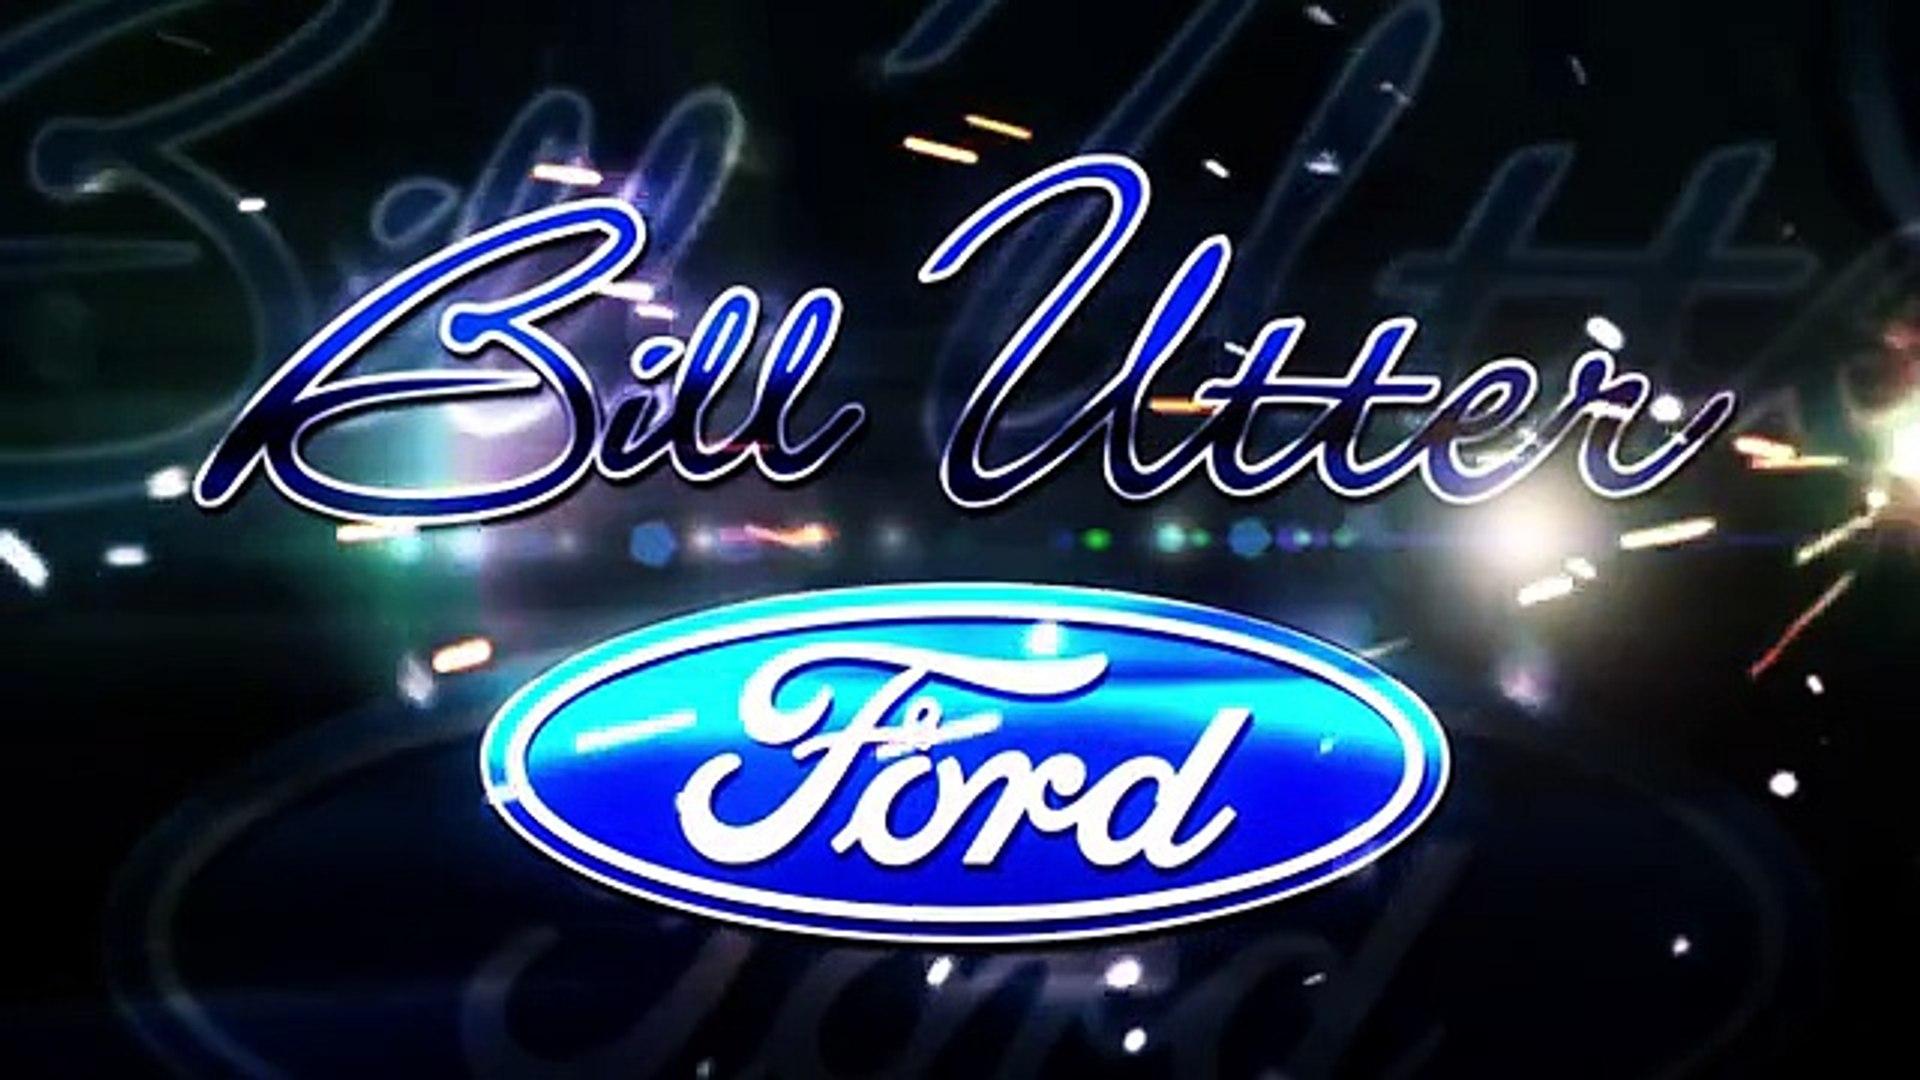 2017 Ford Flex Argyle, TX | Ford Flex Argyle, TX